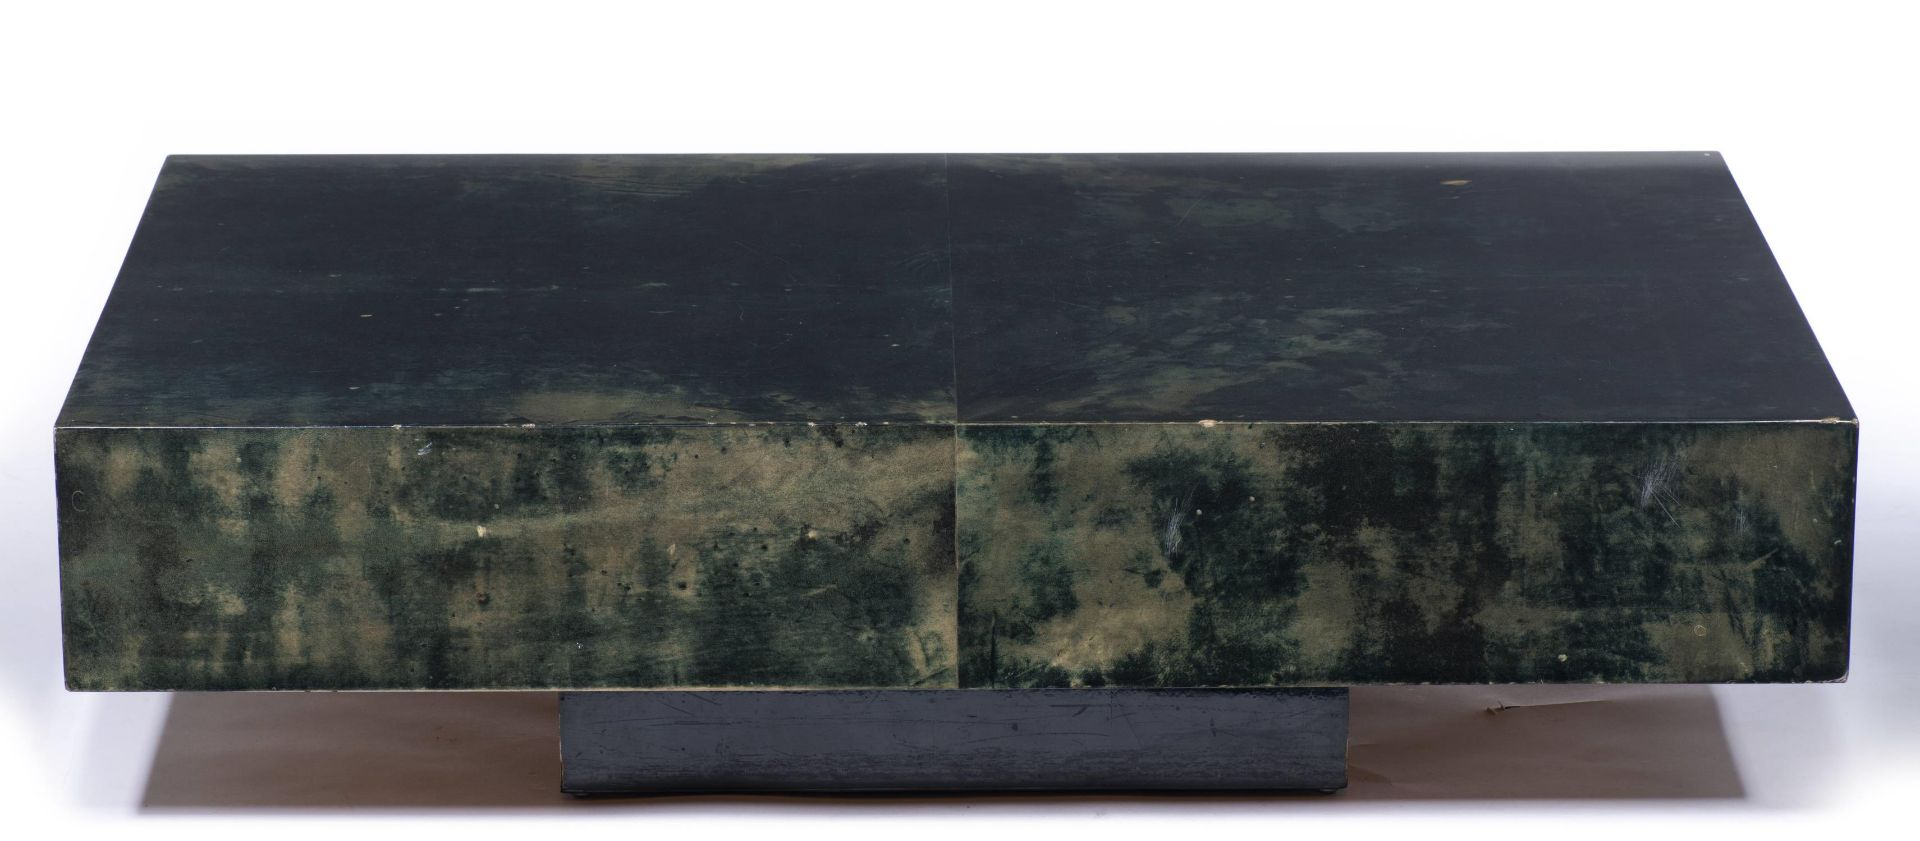 Aldo Tura (1909-1963), table basse modèle 2052 - Bild 2 aus 4